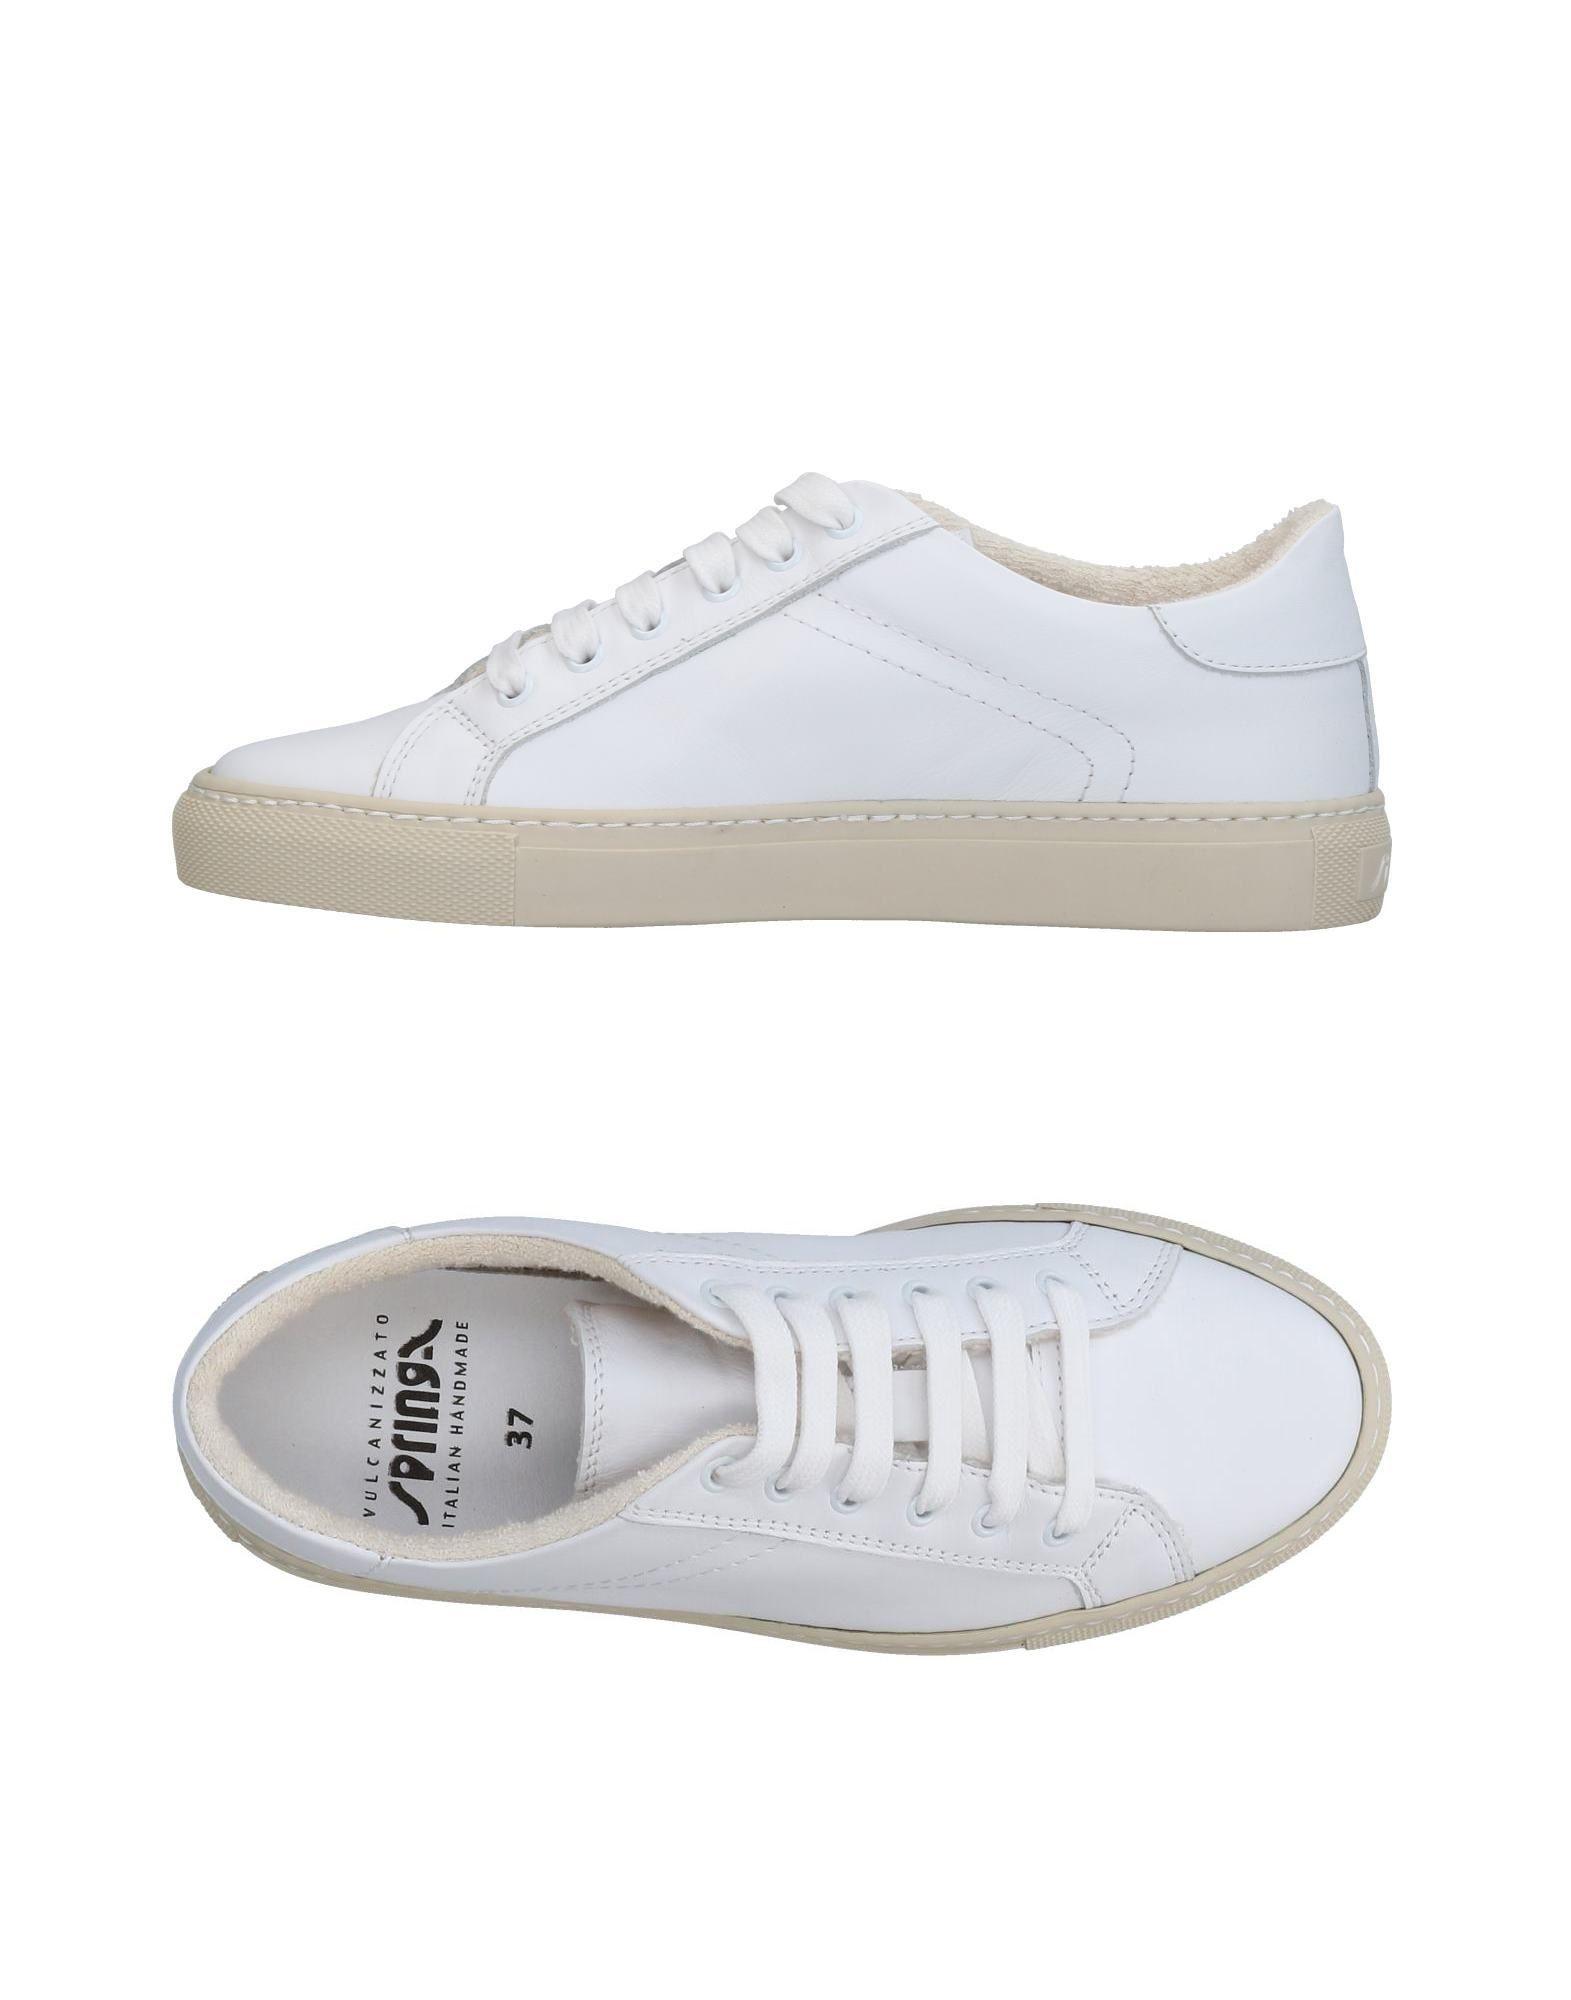 Springa Schuhe Sneakers Damen  11456746MF Gute Qualität beliebte Schuhe Springa 87c481